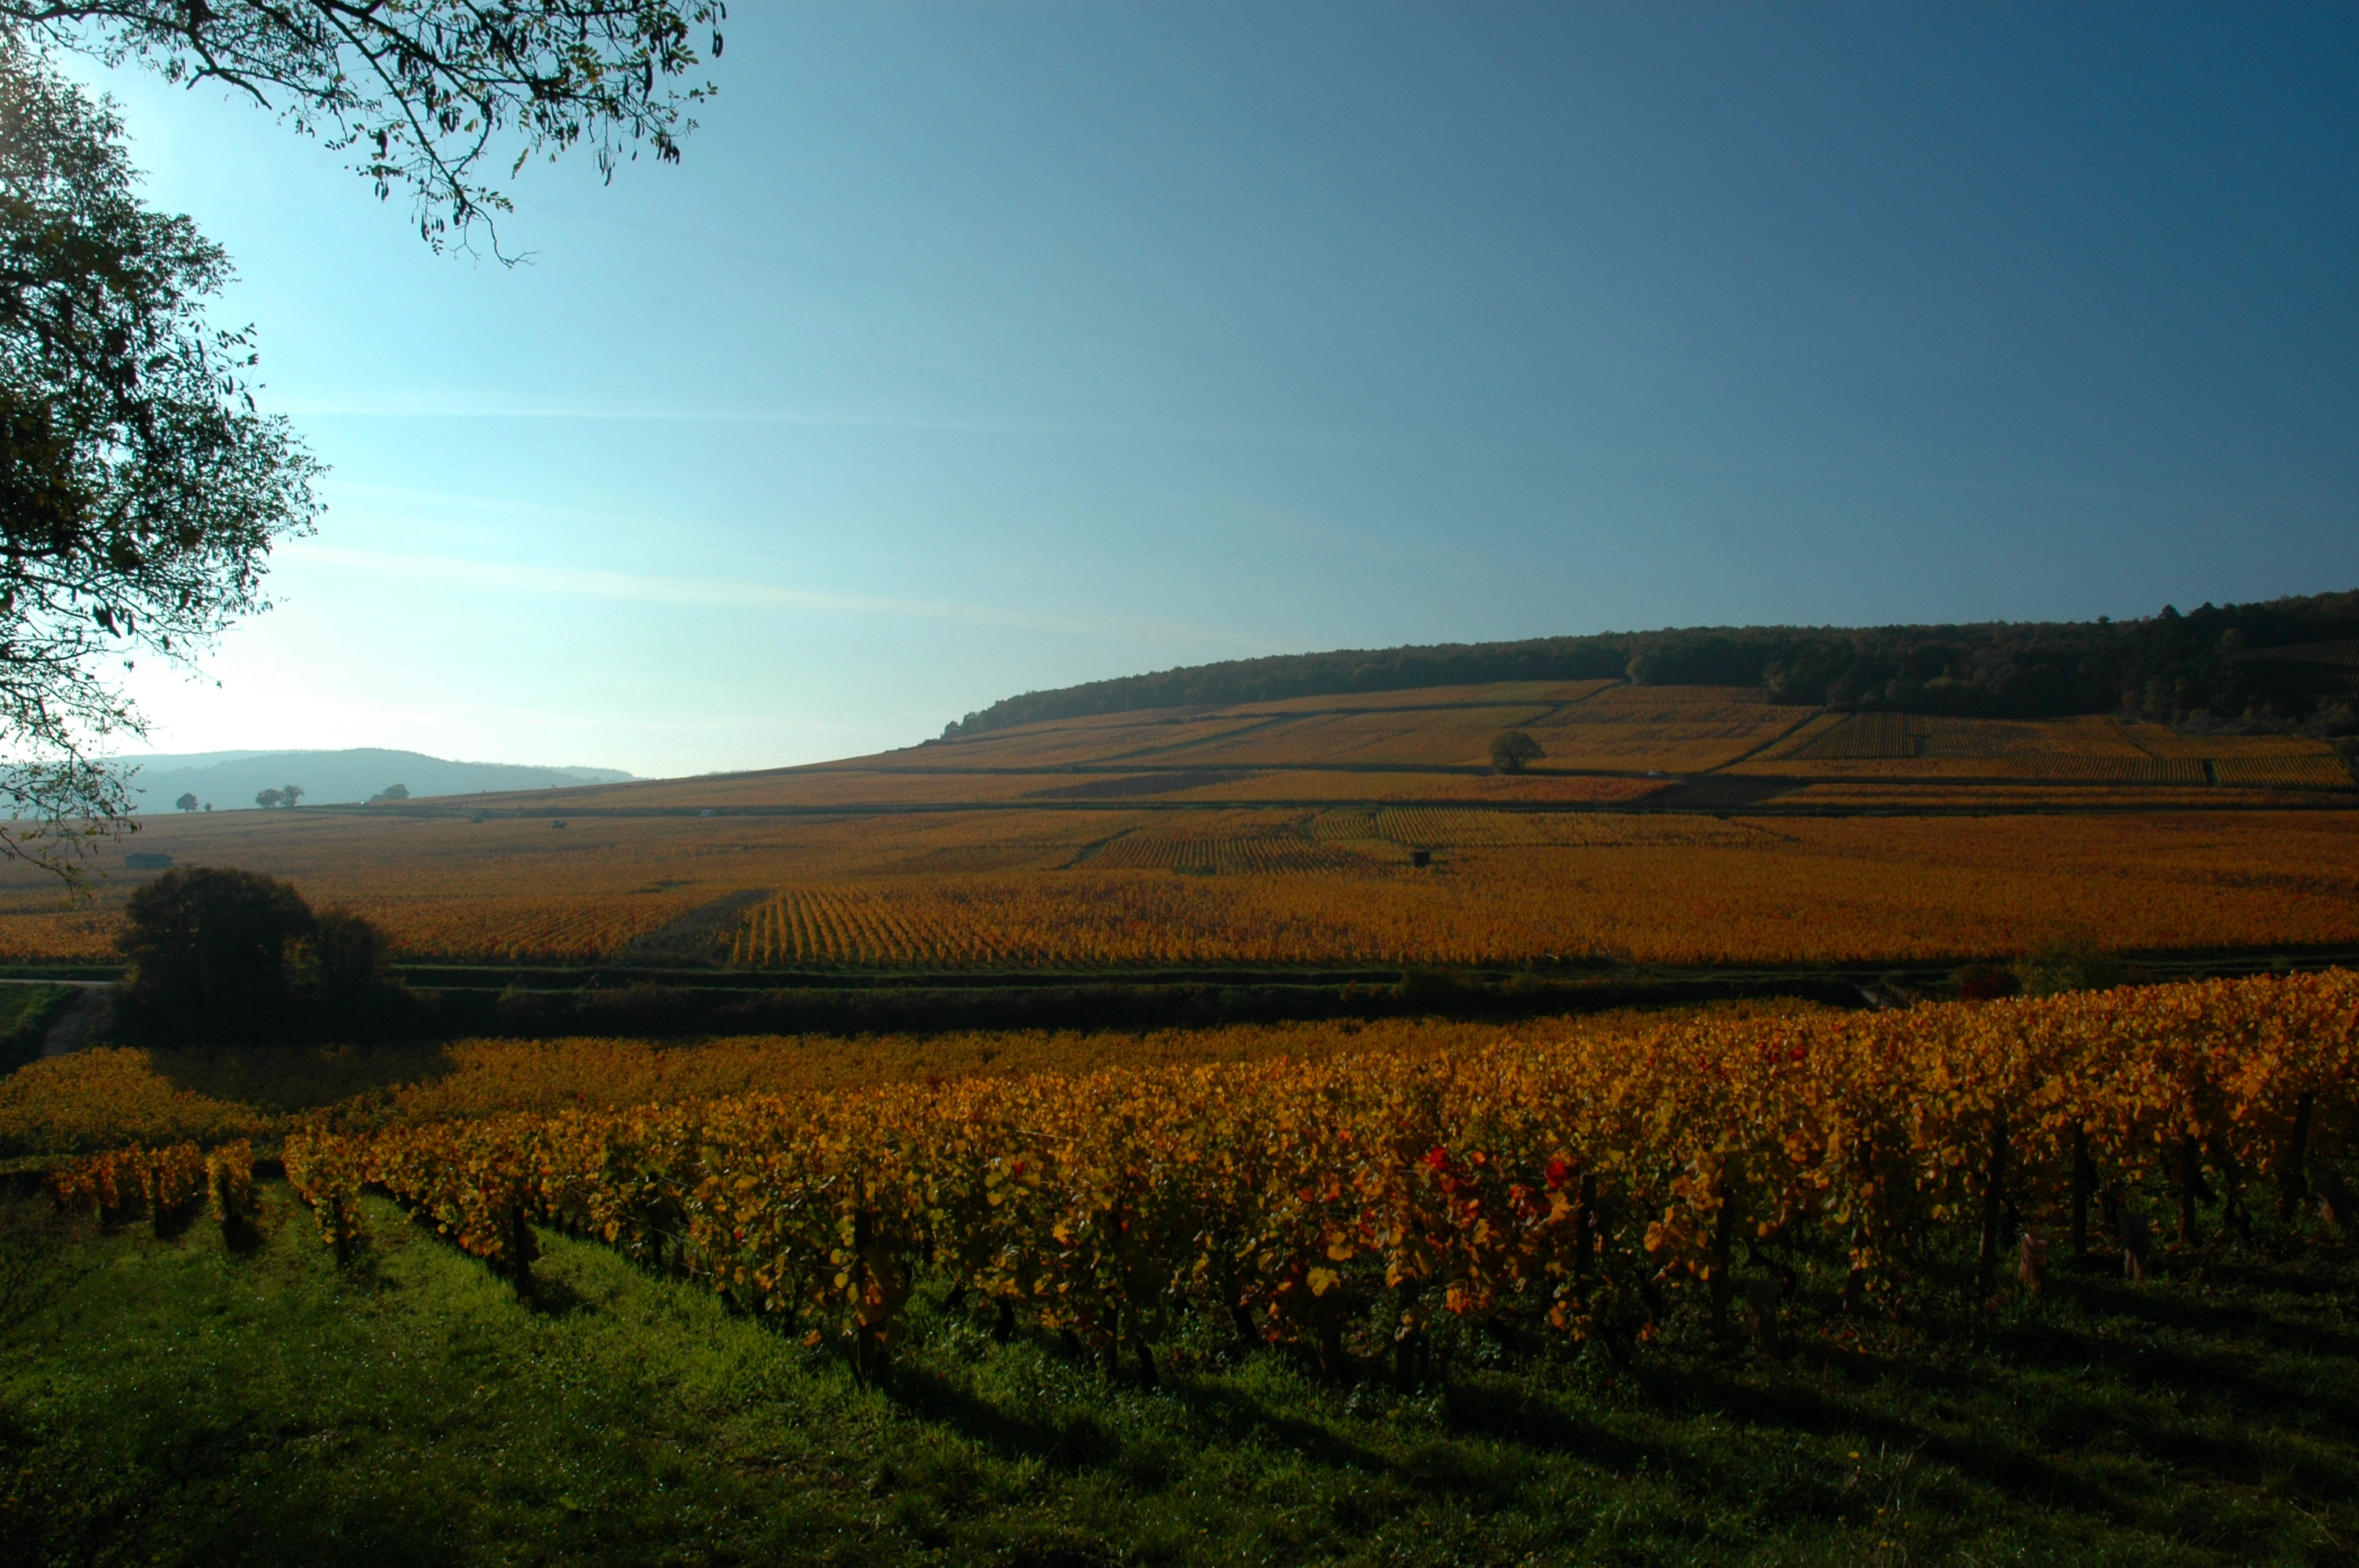 Vignes de Corton proches des Chambres Buissonnieres Ladoix Serrigny route des grands crus (6)